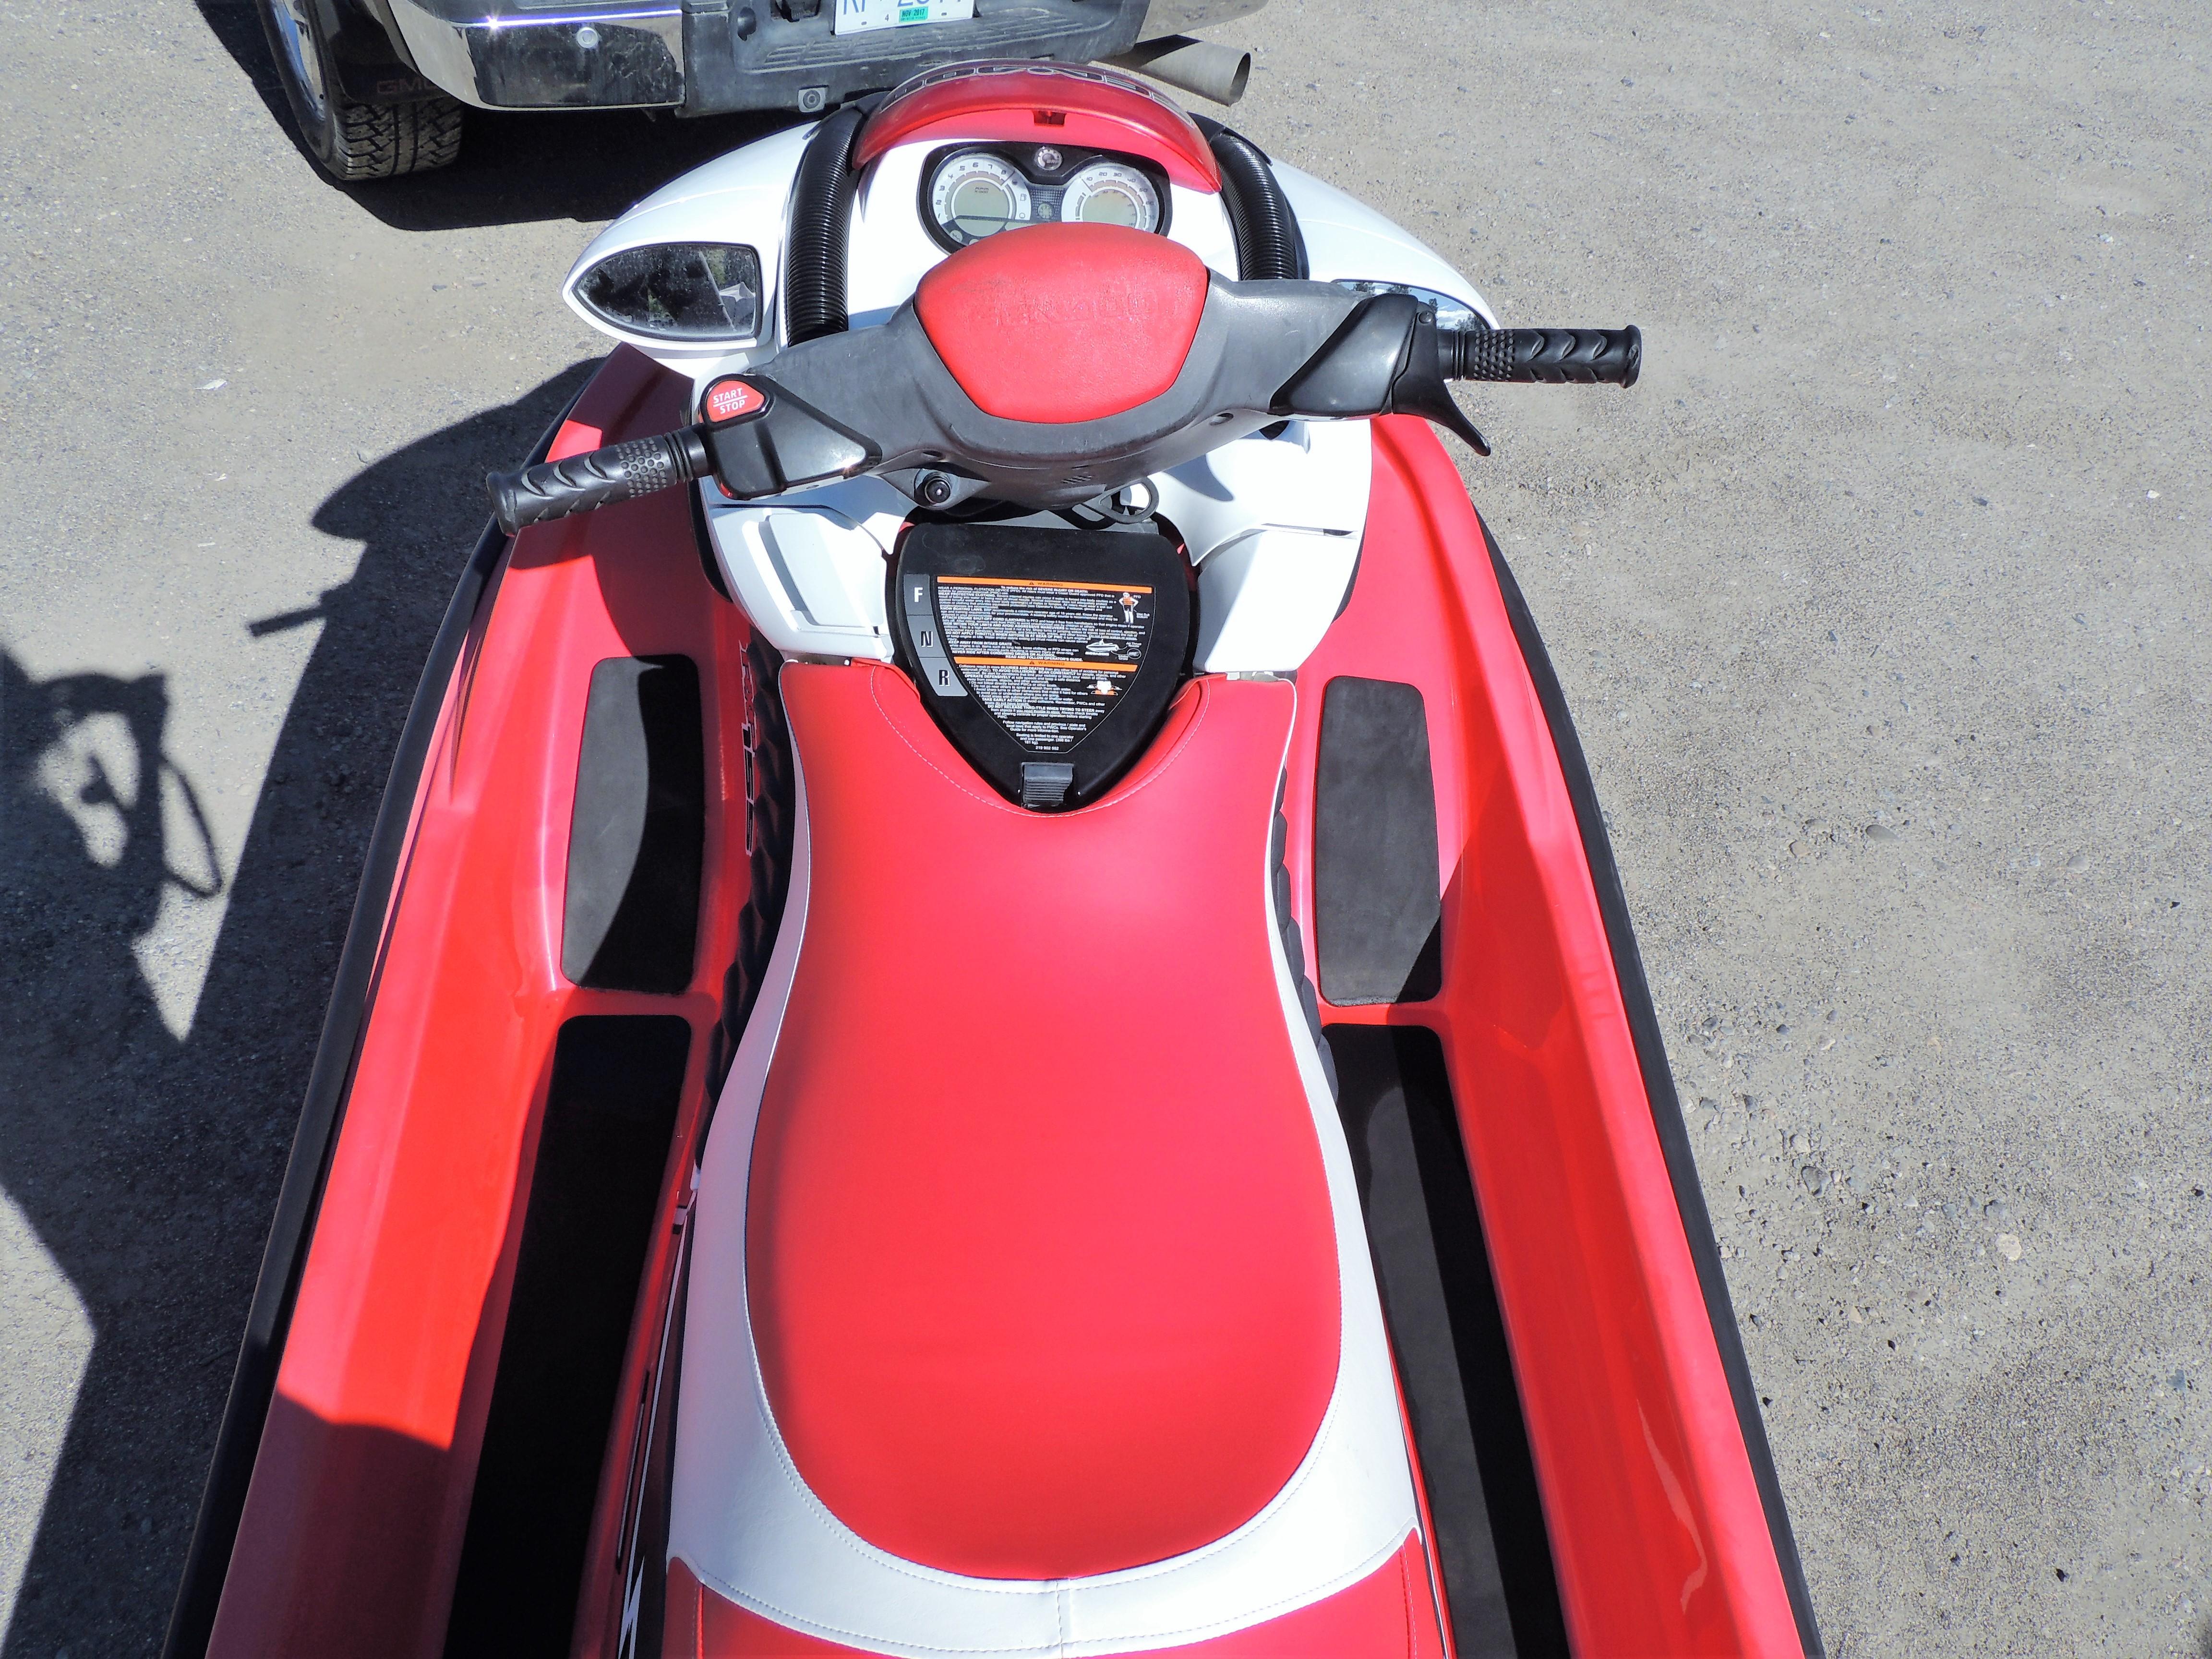 2008 Seadoo RXP 155